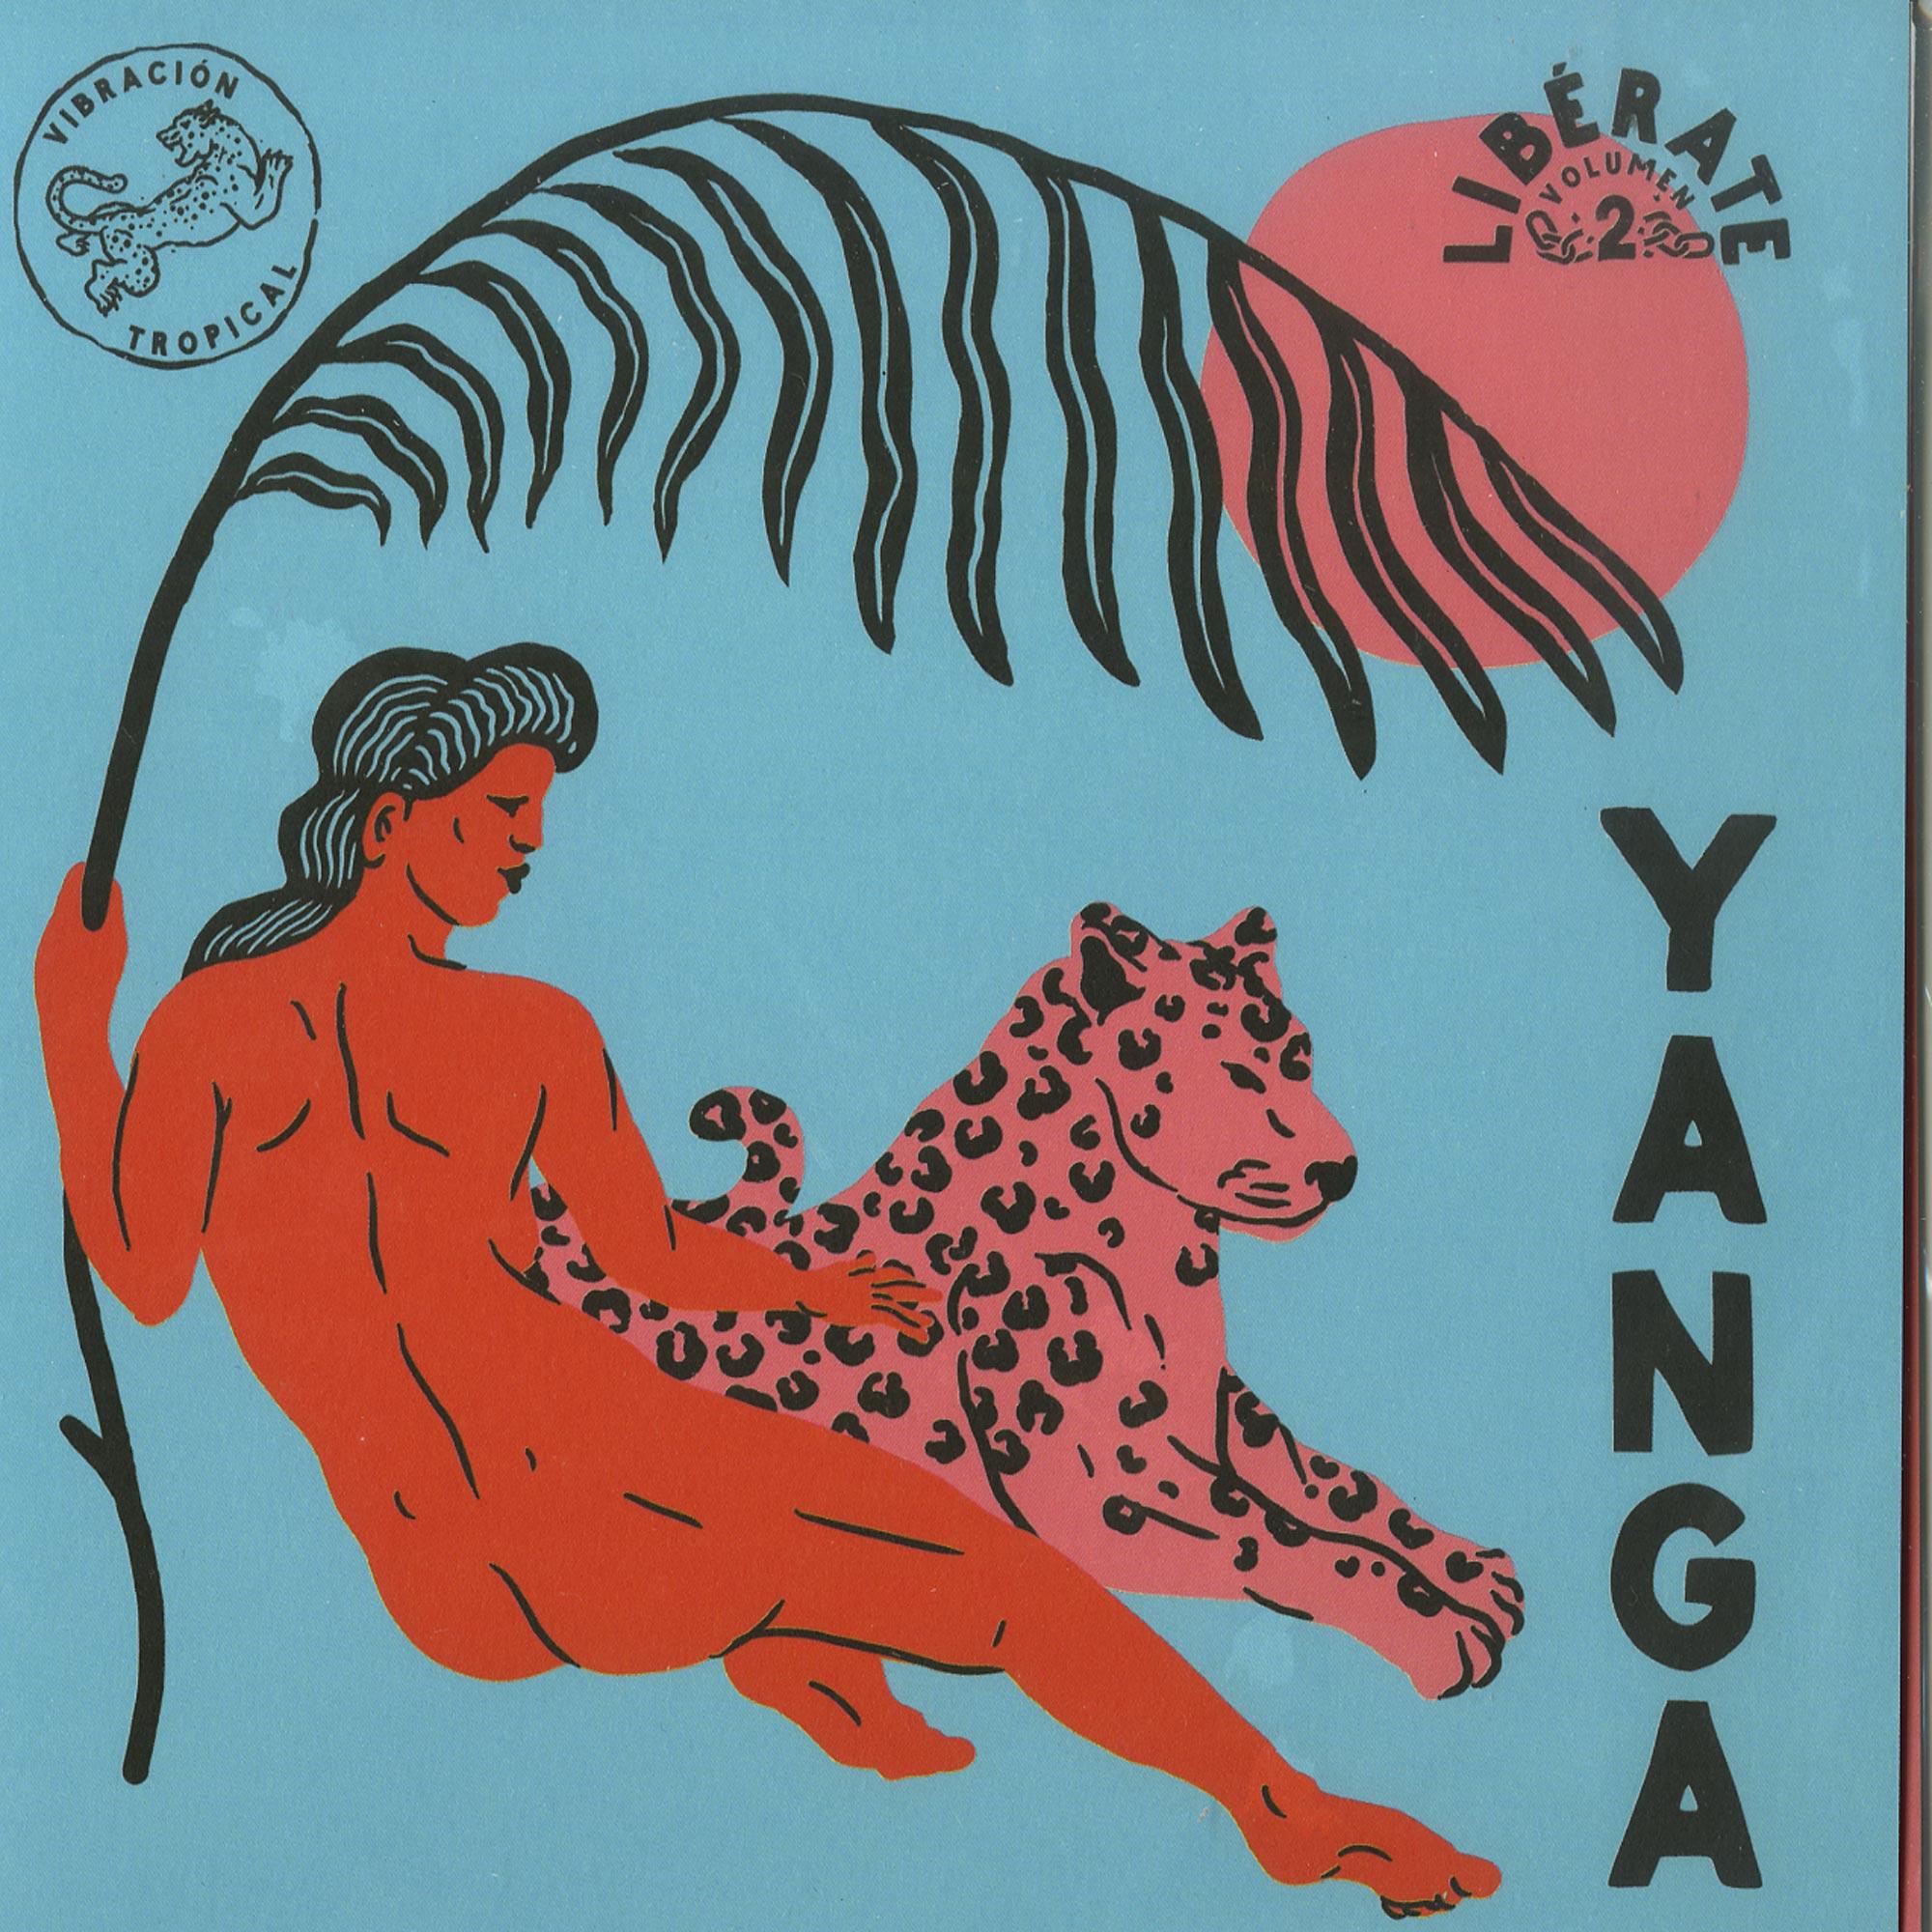 Yanga - LIBERATE VOL. 2